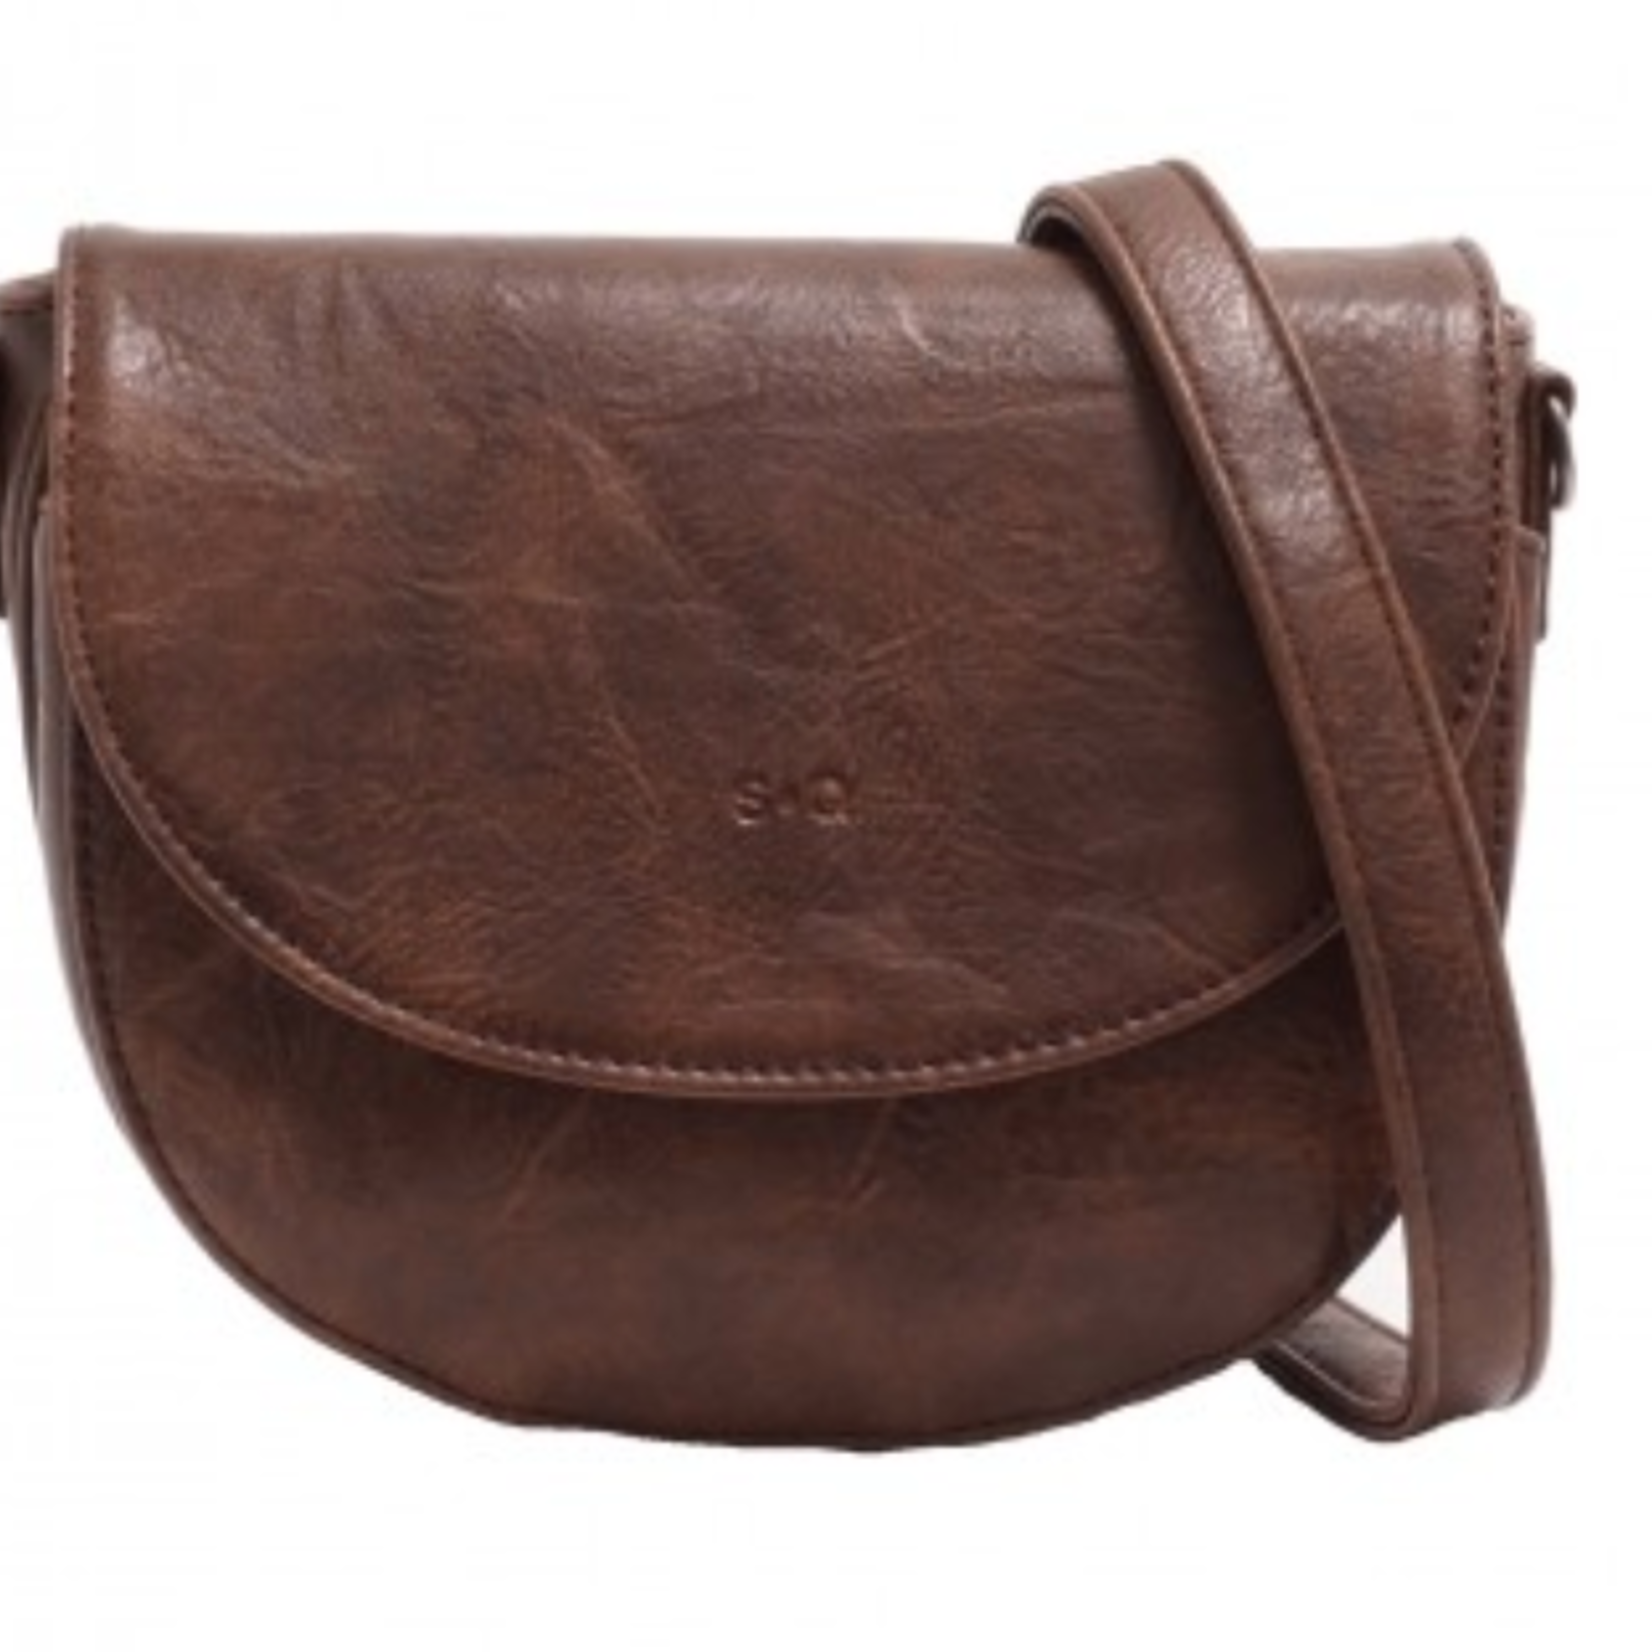 S-Q Inc. Erica Belt Bag